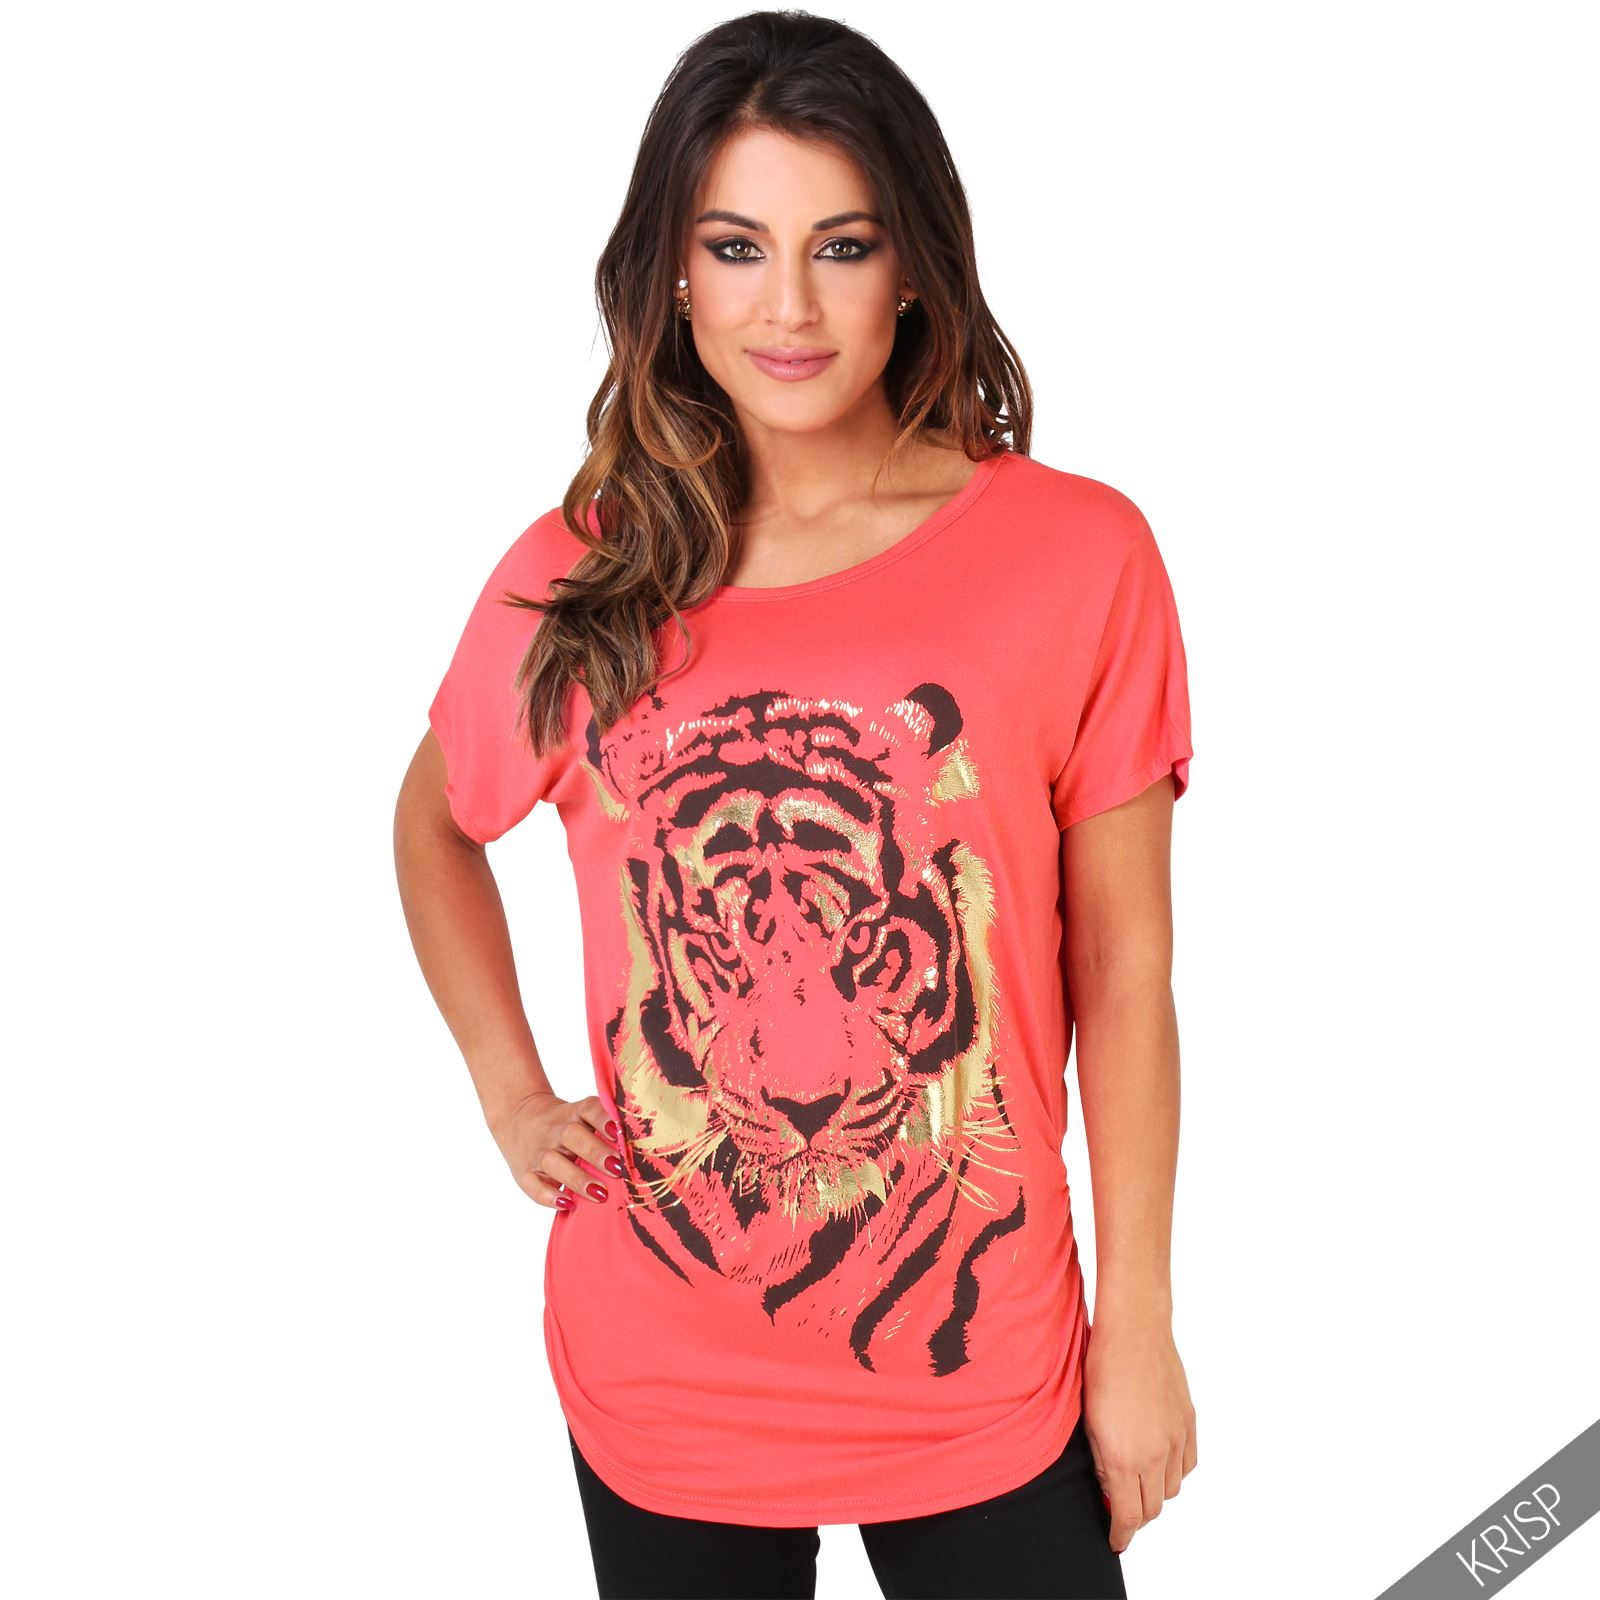 e4dbec06a Womens Ladies Batwing Oversized Jersey T-shirt Top Short Sleeve ...